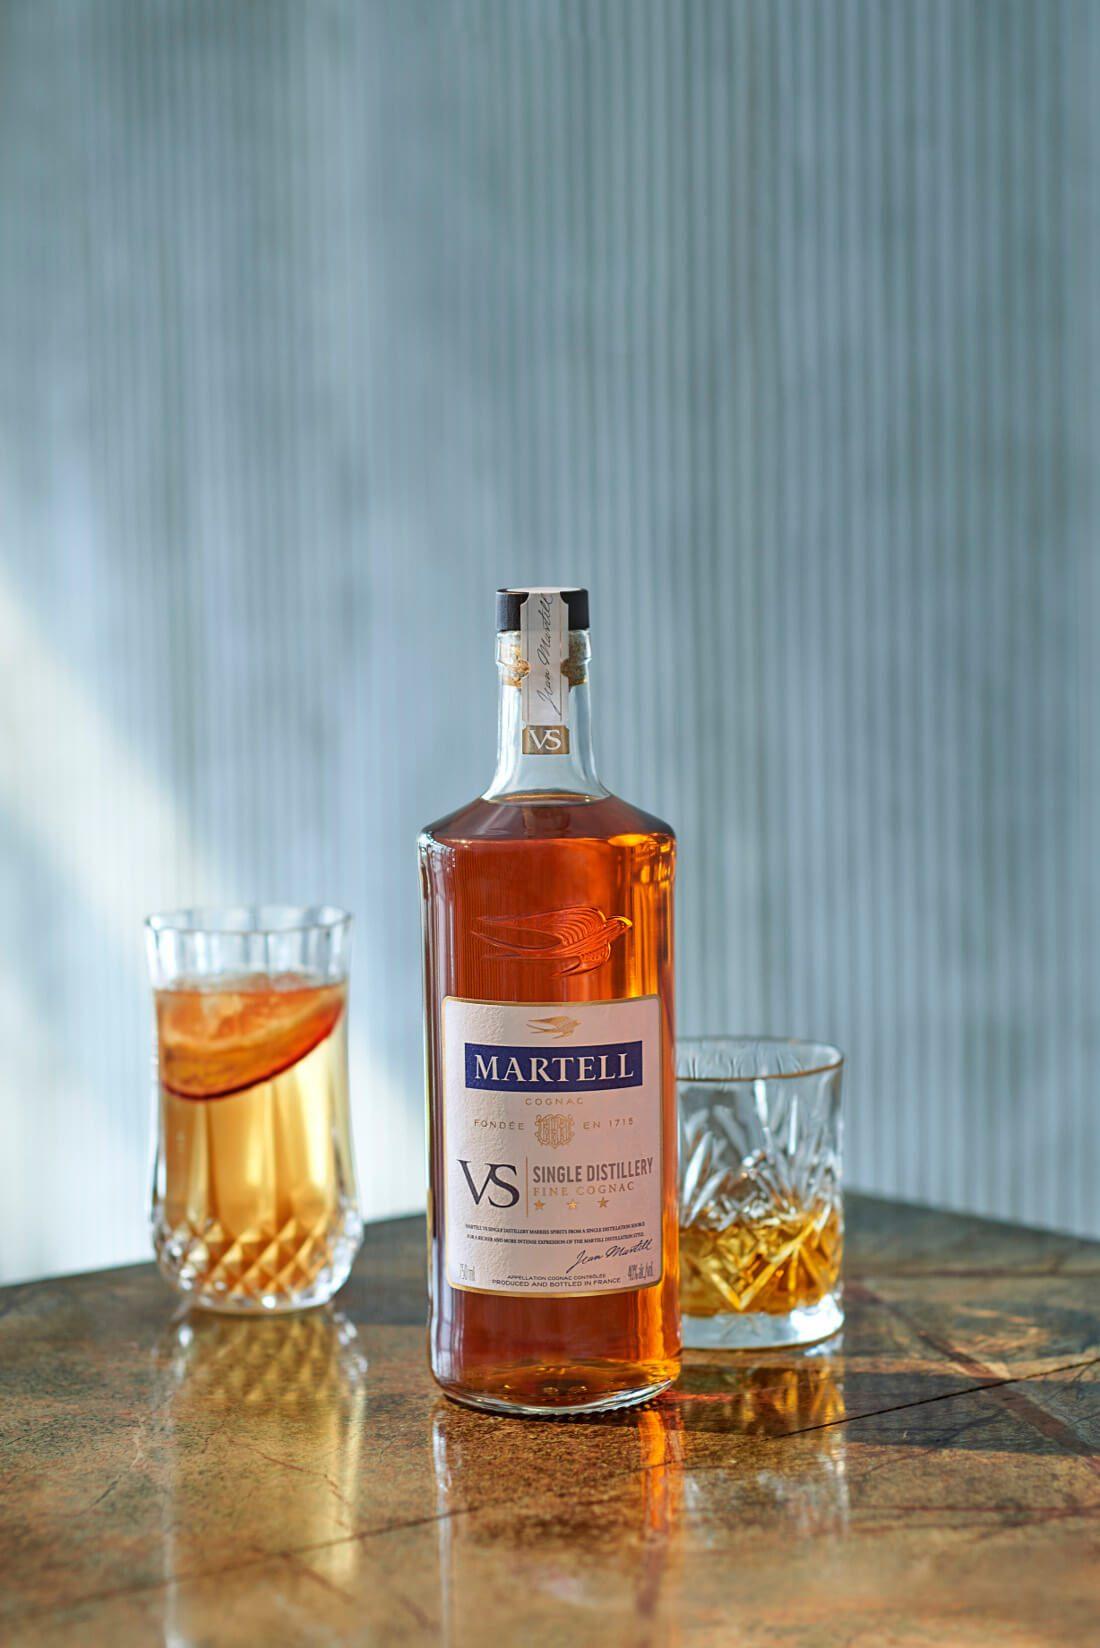 martell-vs-single-distillery-digital-picture-raw-visual-8